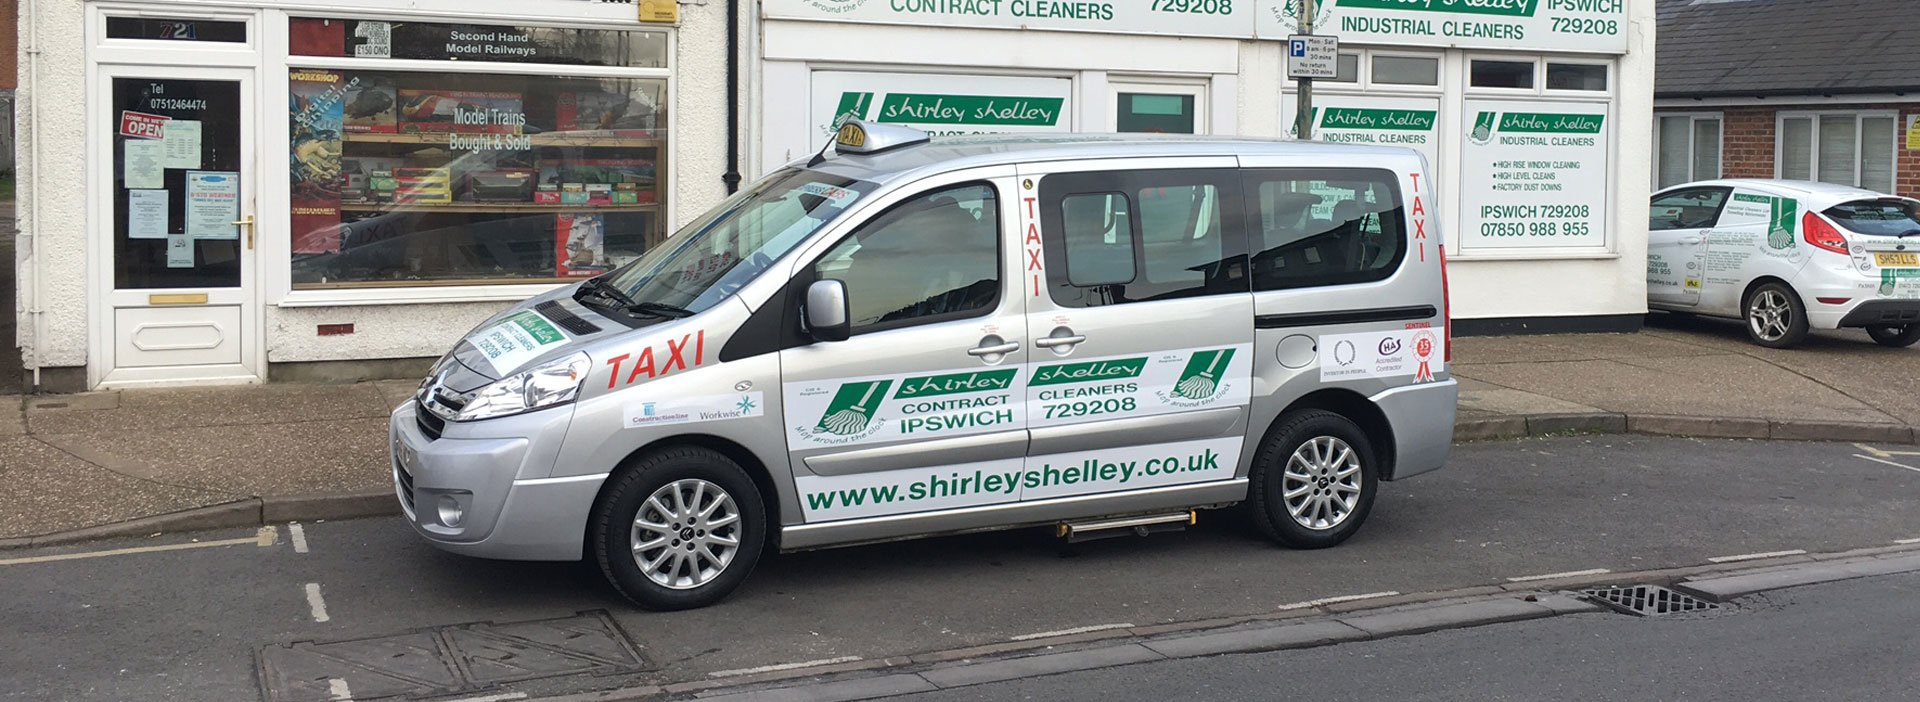 Shirly shelly van